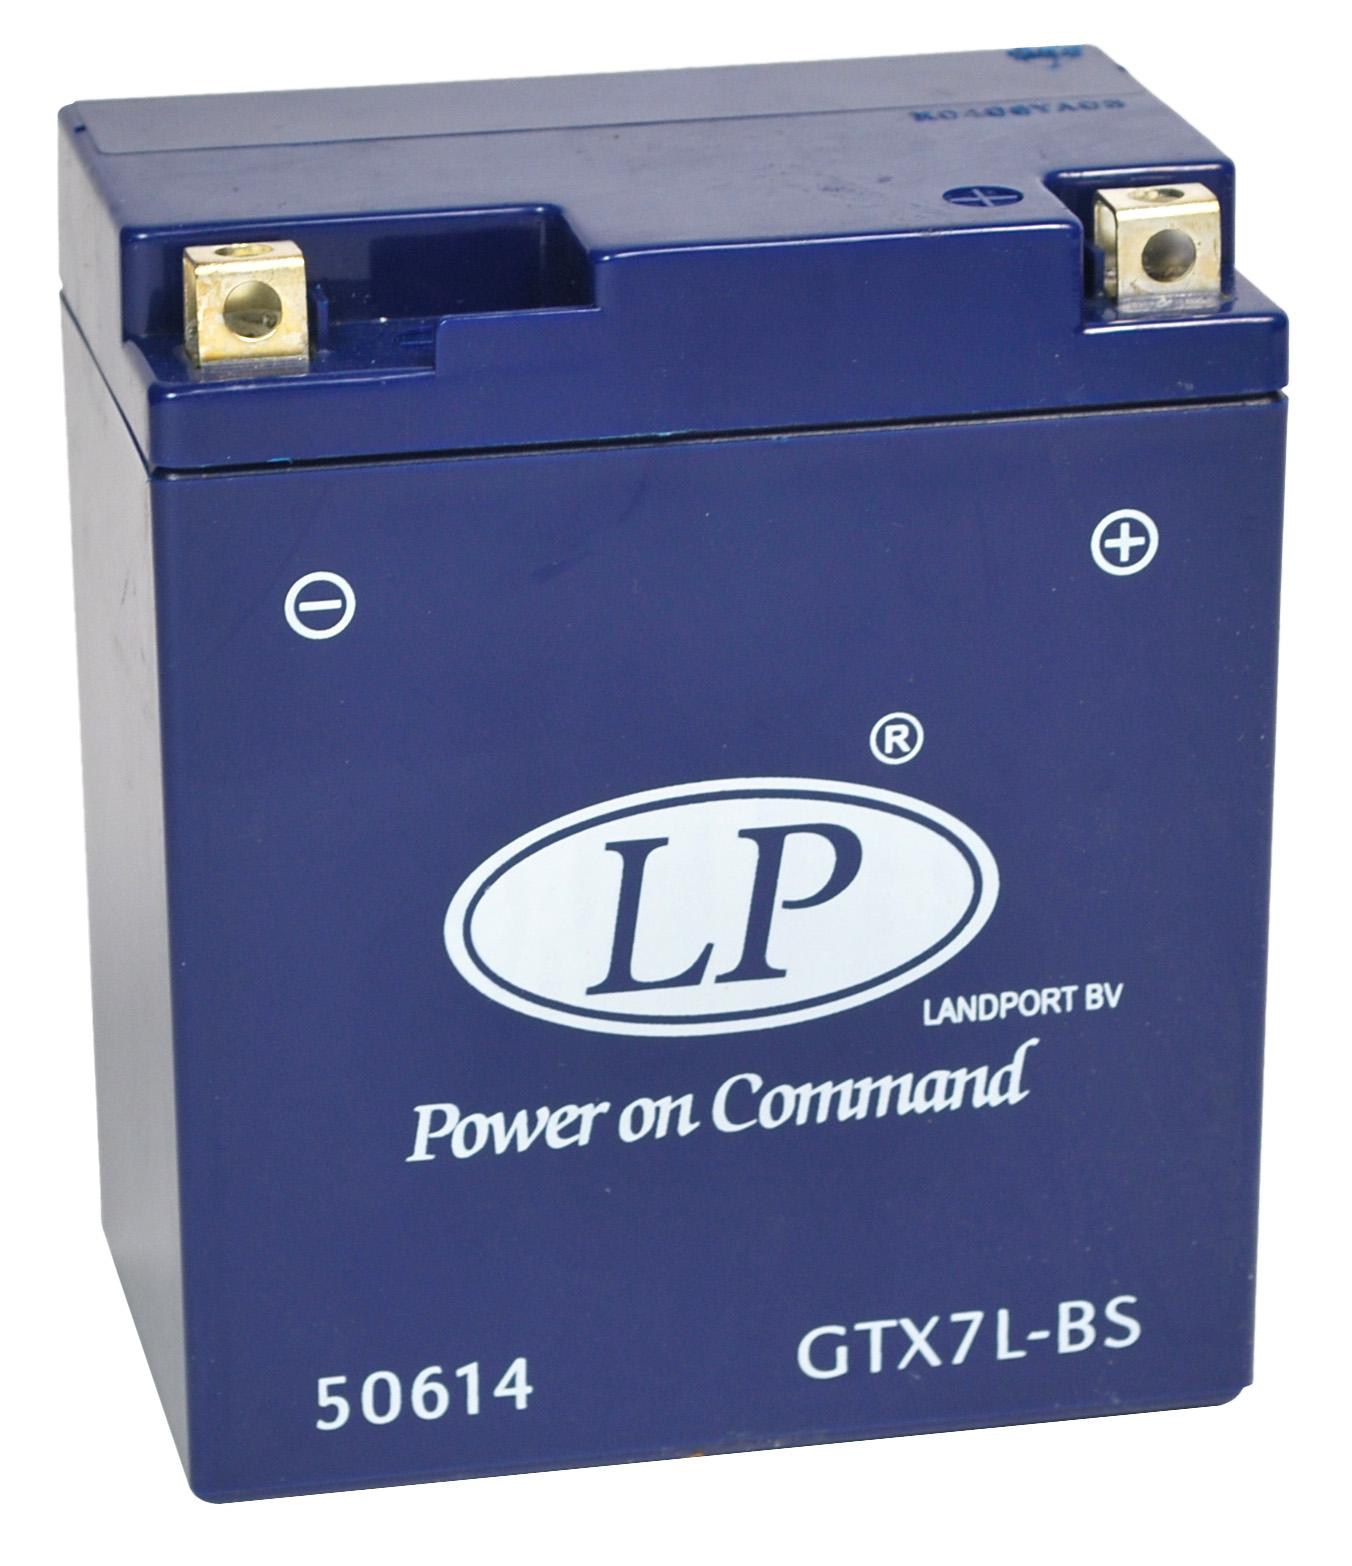 GTX7L-BS motor accu Gel